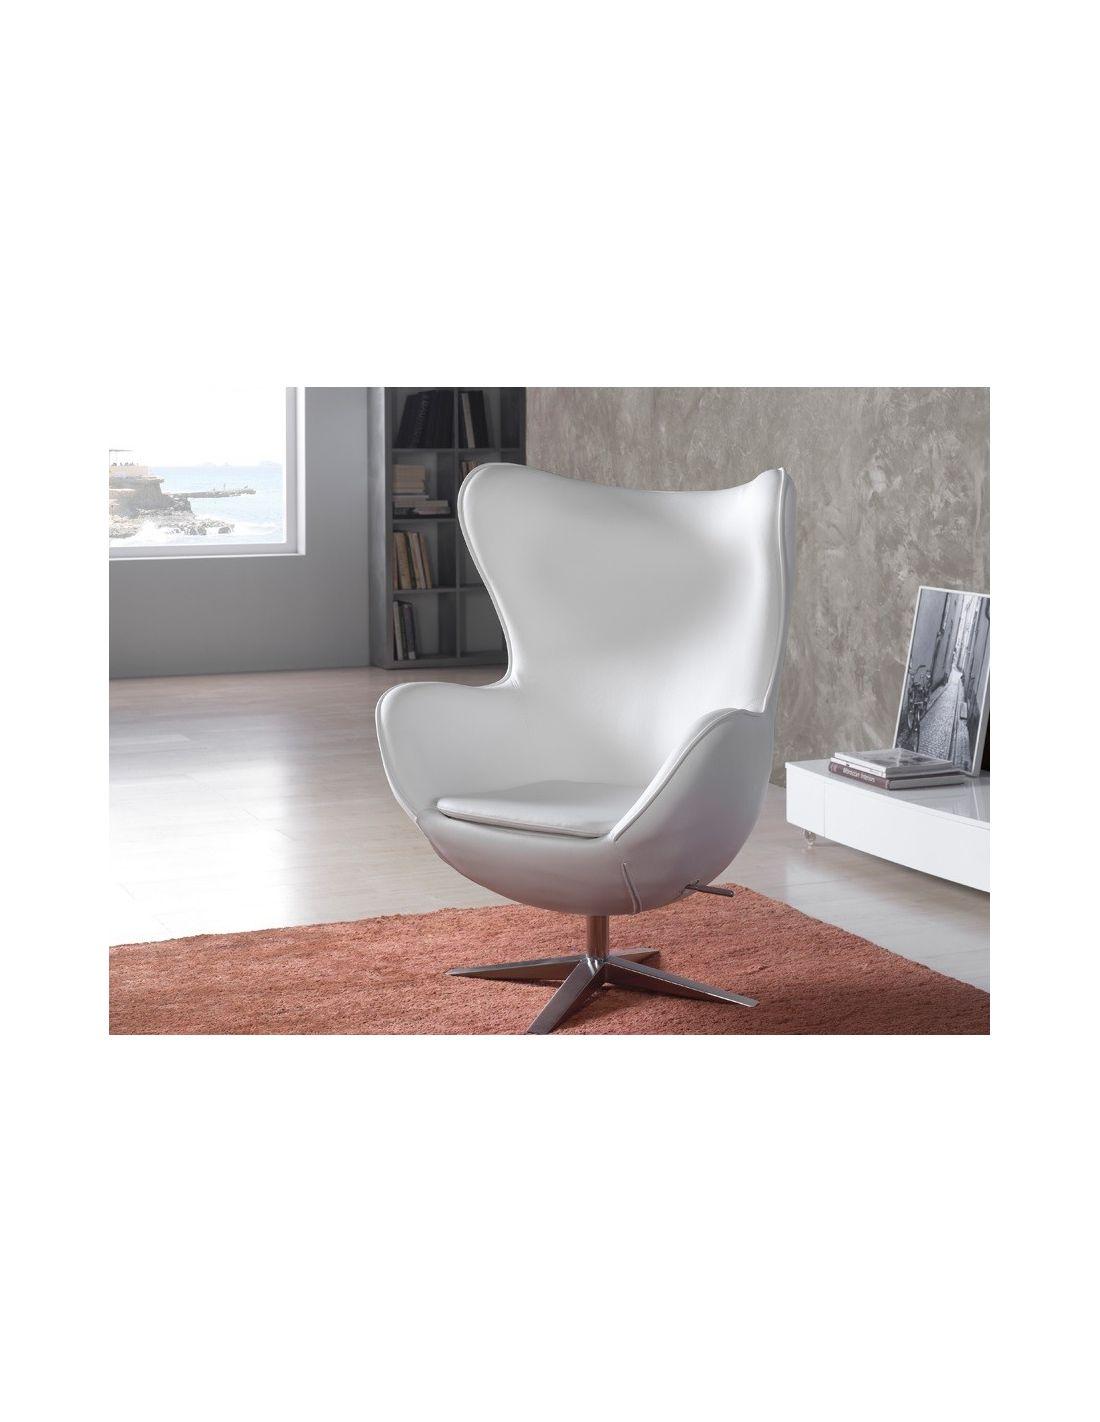 Sill n egg blanca ecopiel colecci n de sillones jeans de for Sillon blanco para dormitorio